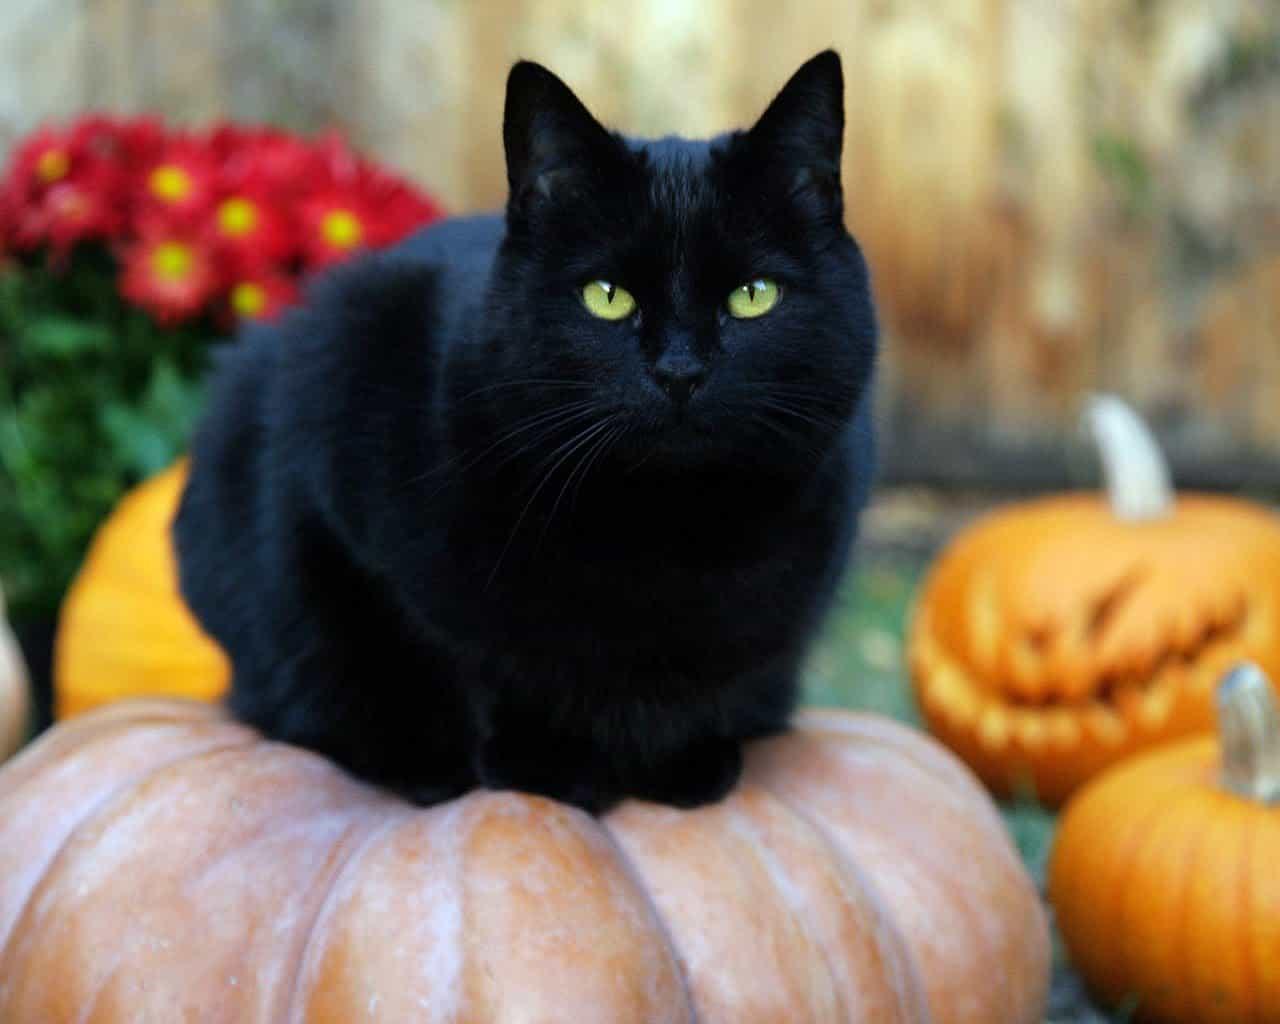 Výsledek obrázku pro black cat